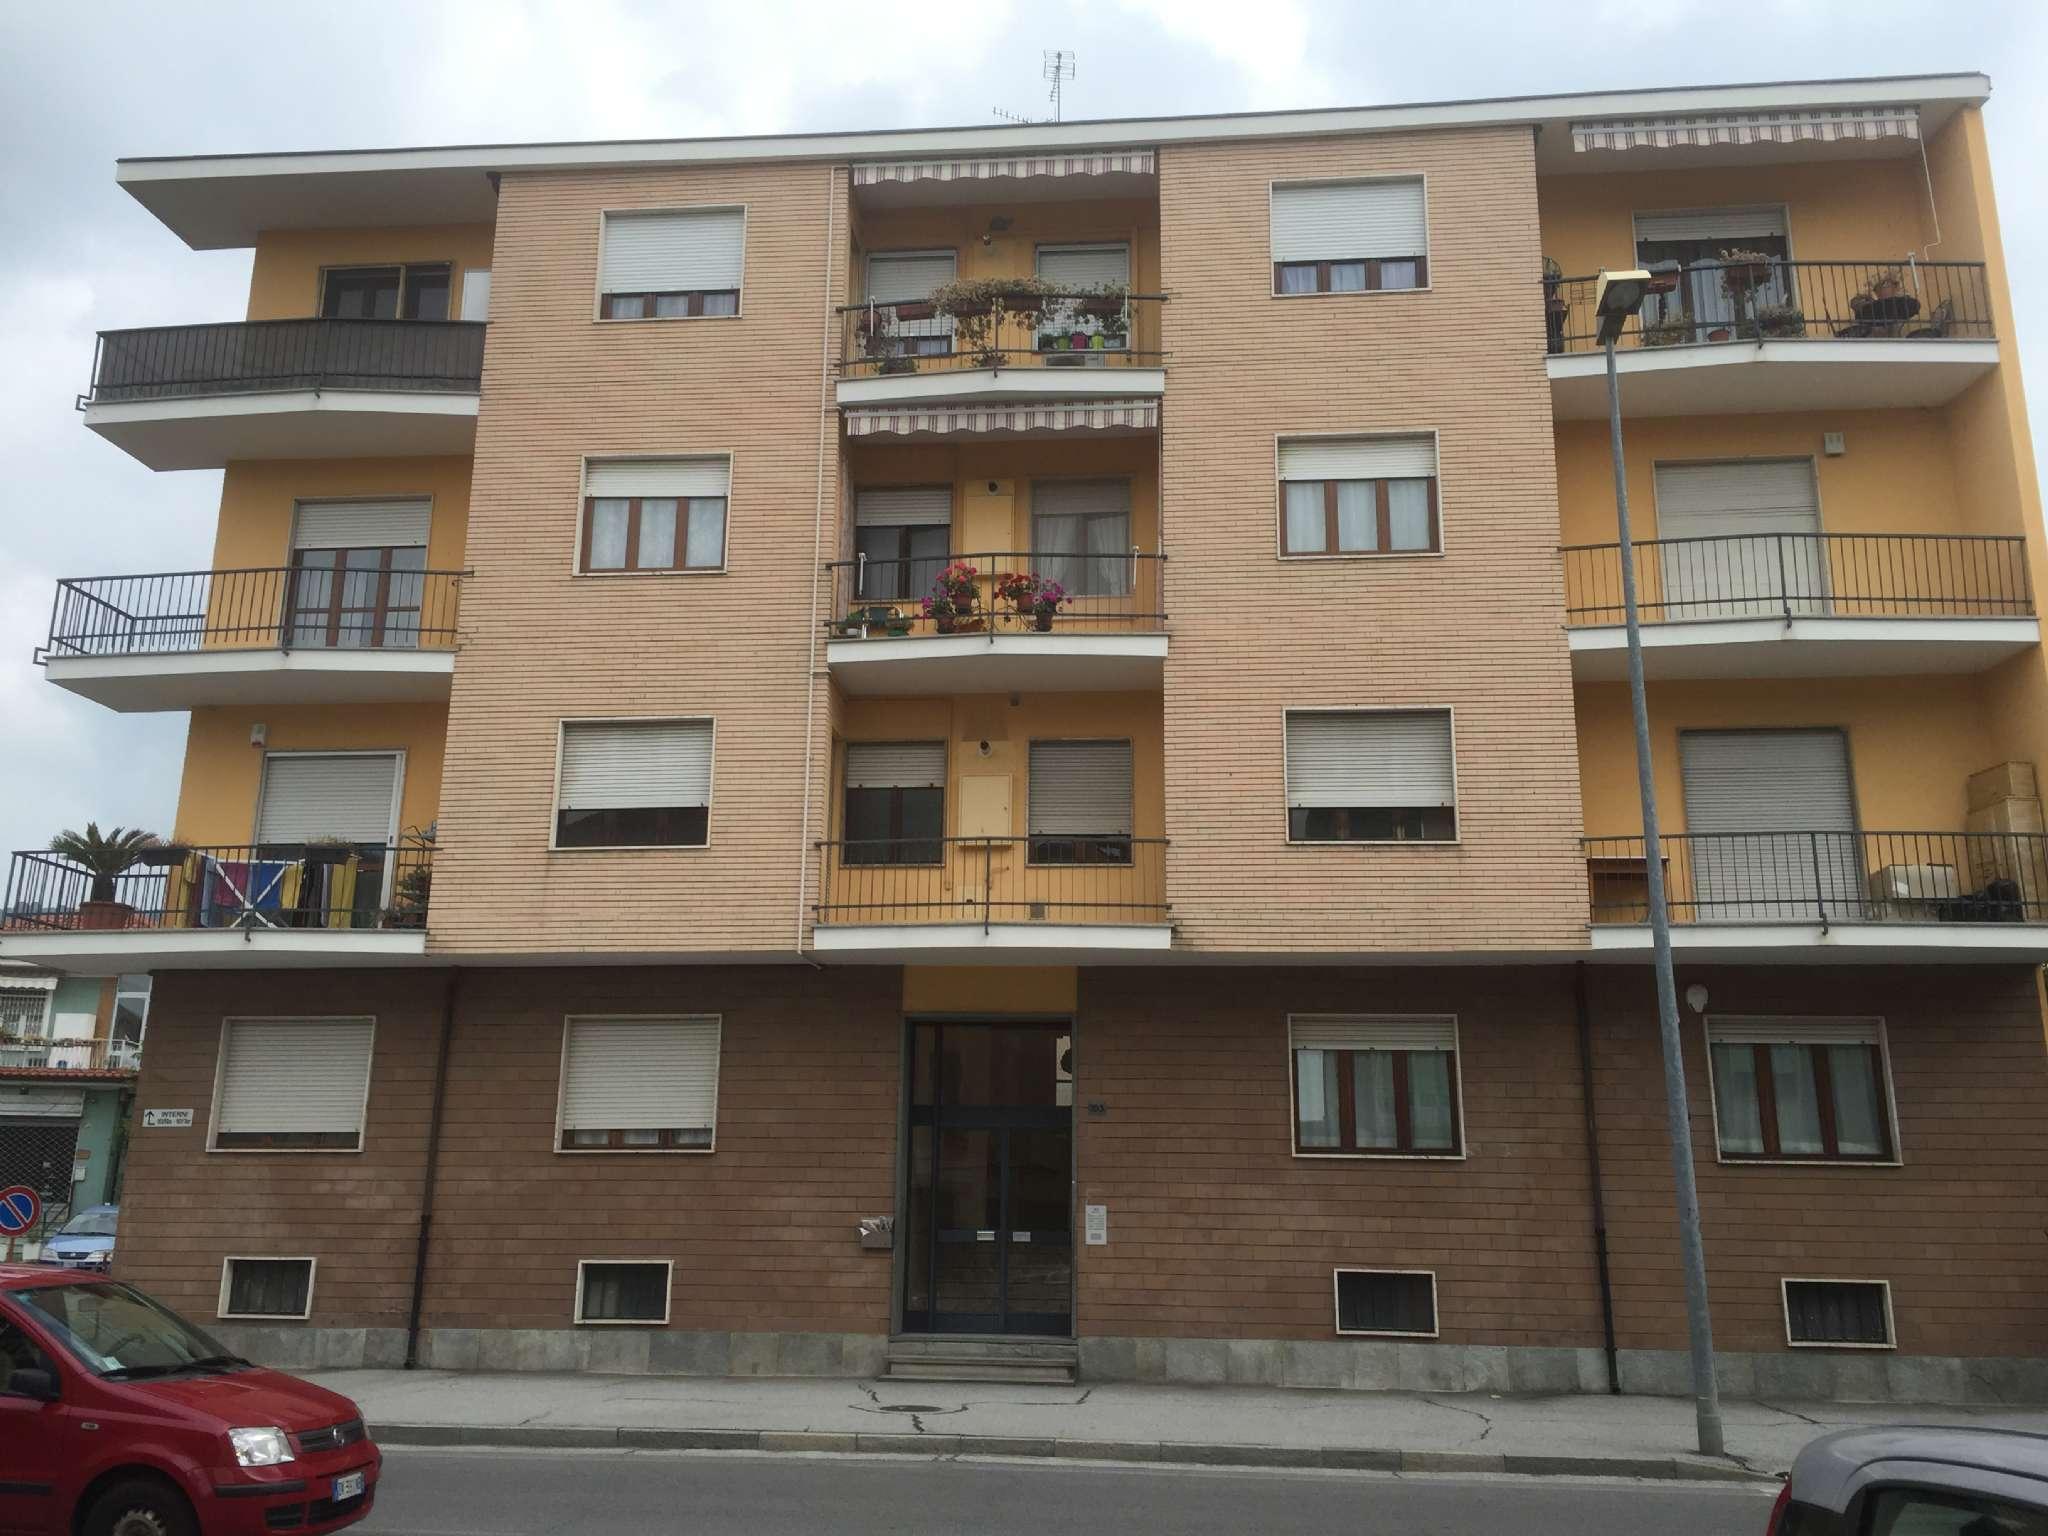 Appartamento in vendita strada genova 163 Moncalieri